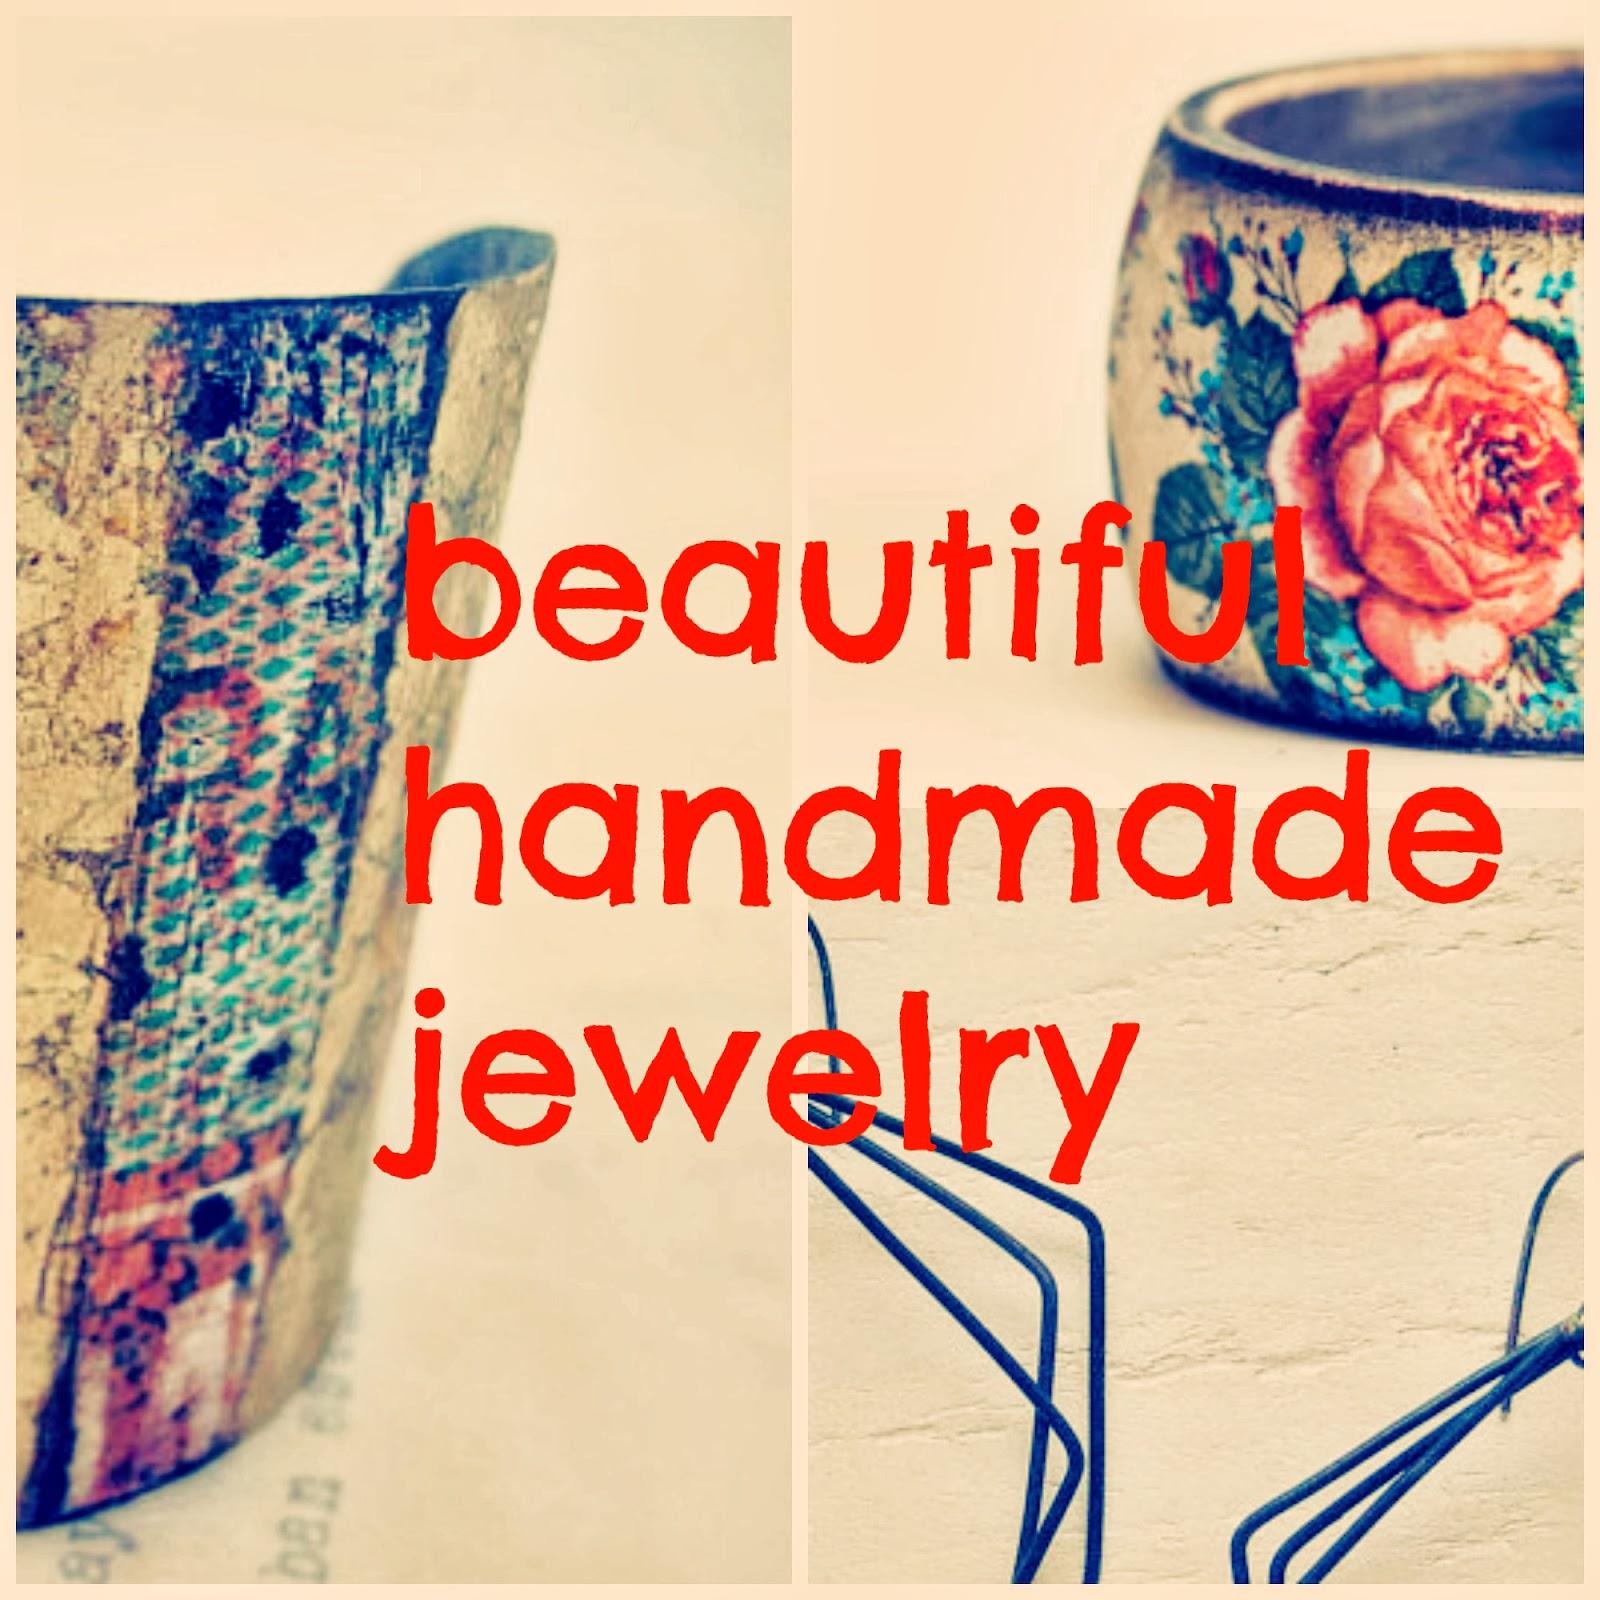 a few pretty things: I want it all! Beautiful handmade jewelry